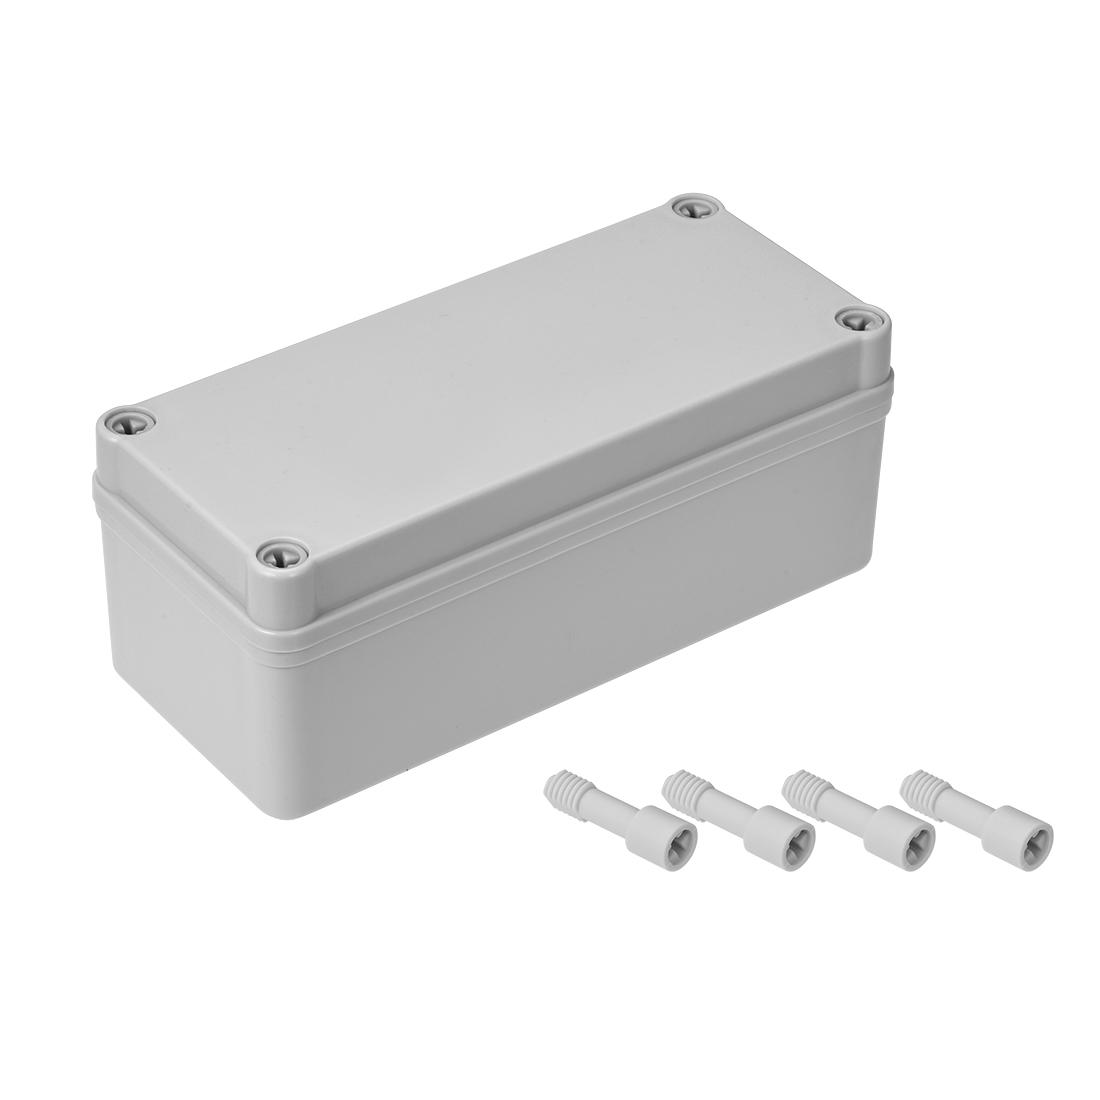 180mmx80mmx70mm Dustproof IP65 Junction Box DIY Case Enclosure Gray